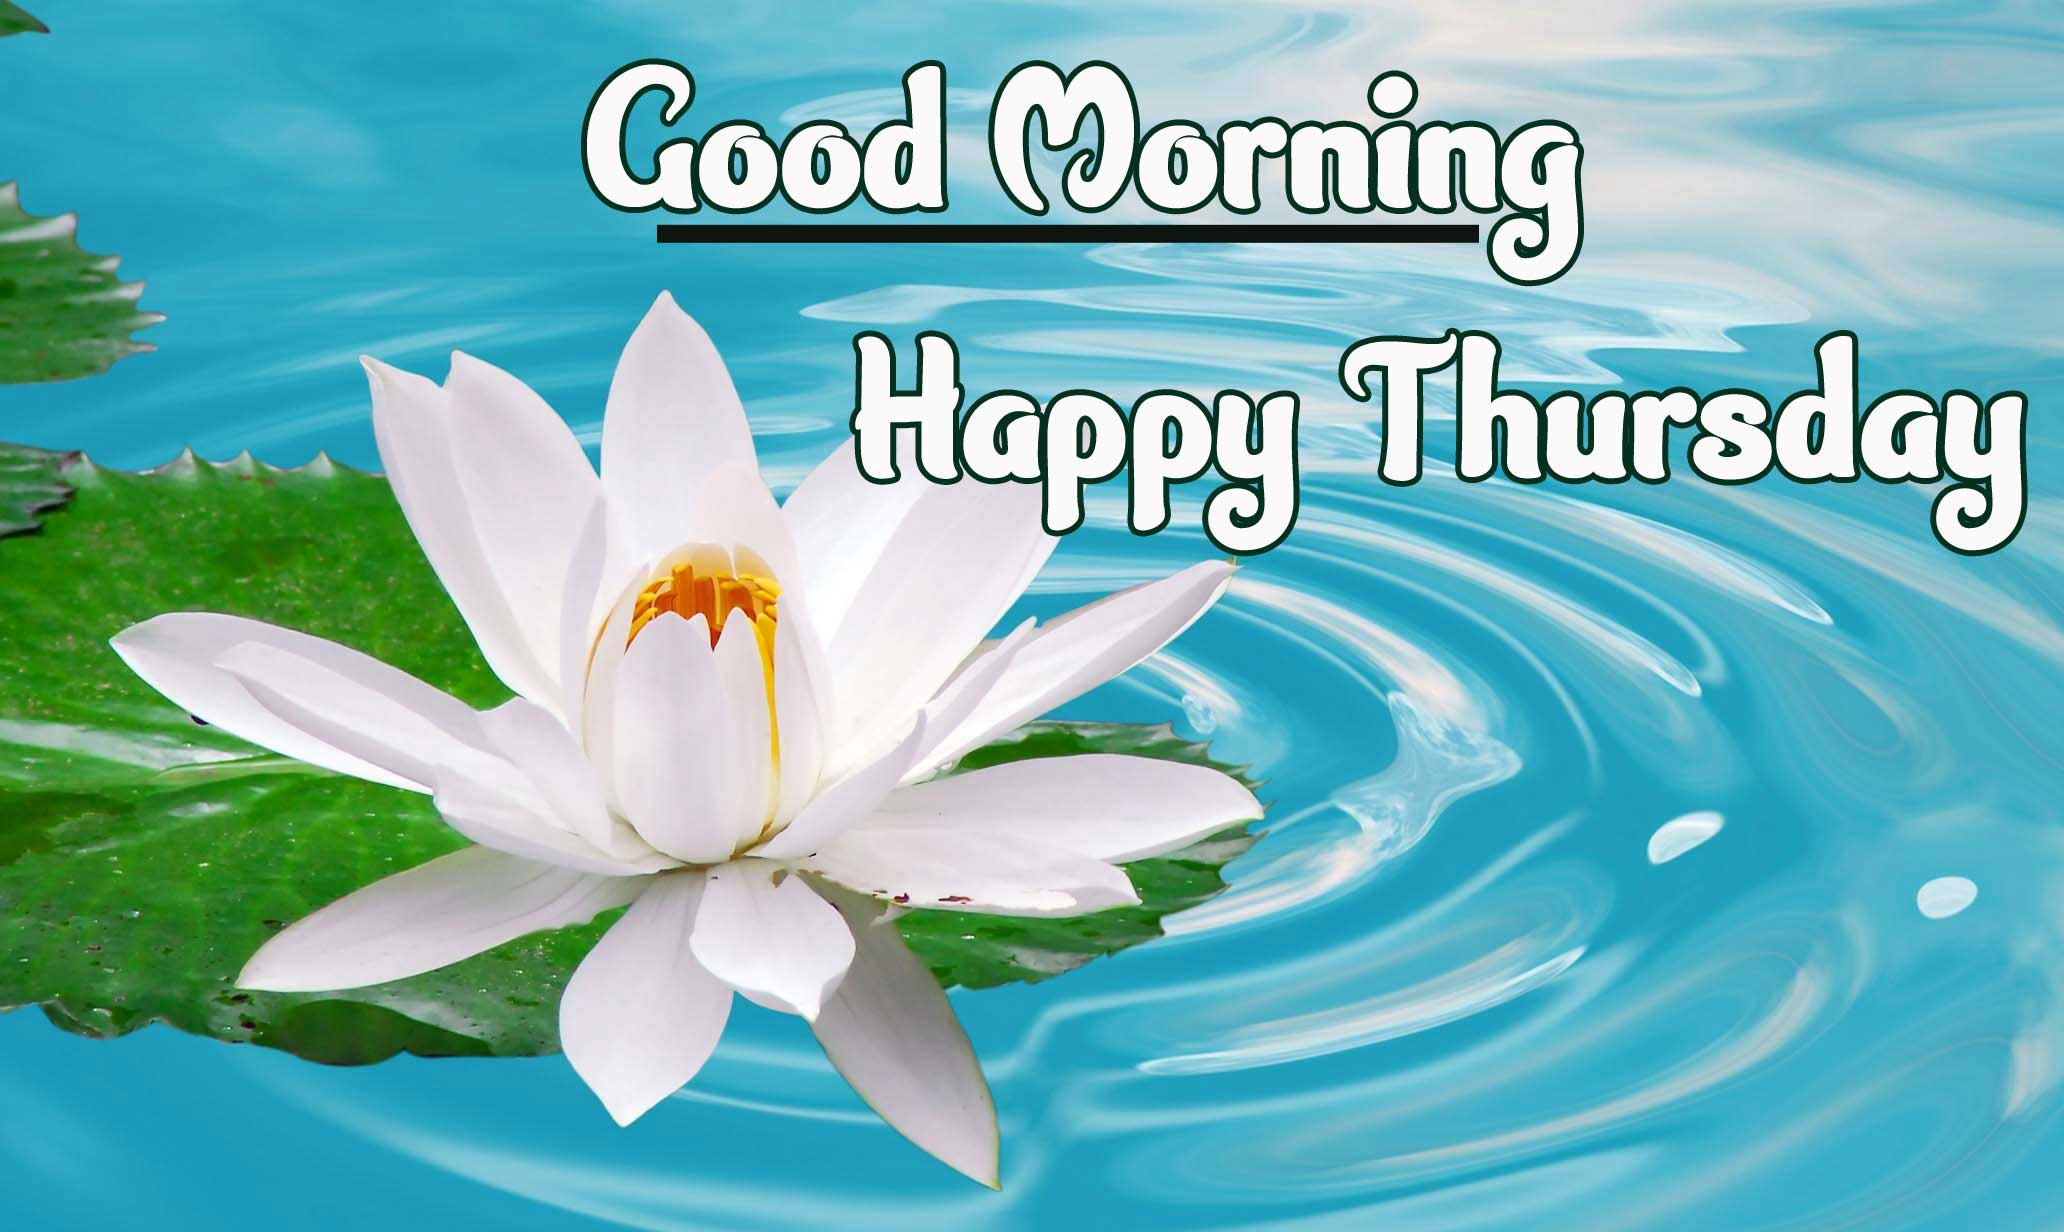 Thursday Good Morning Images Wallpaper pics Download